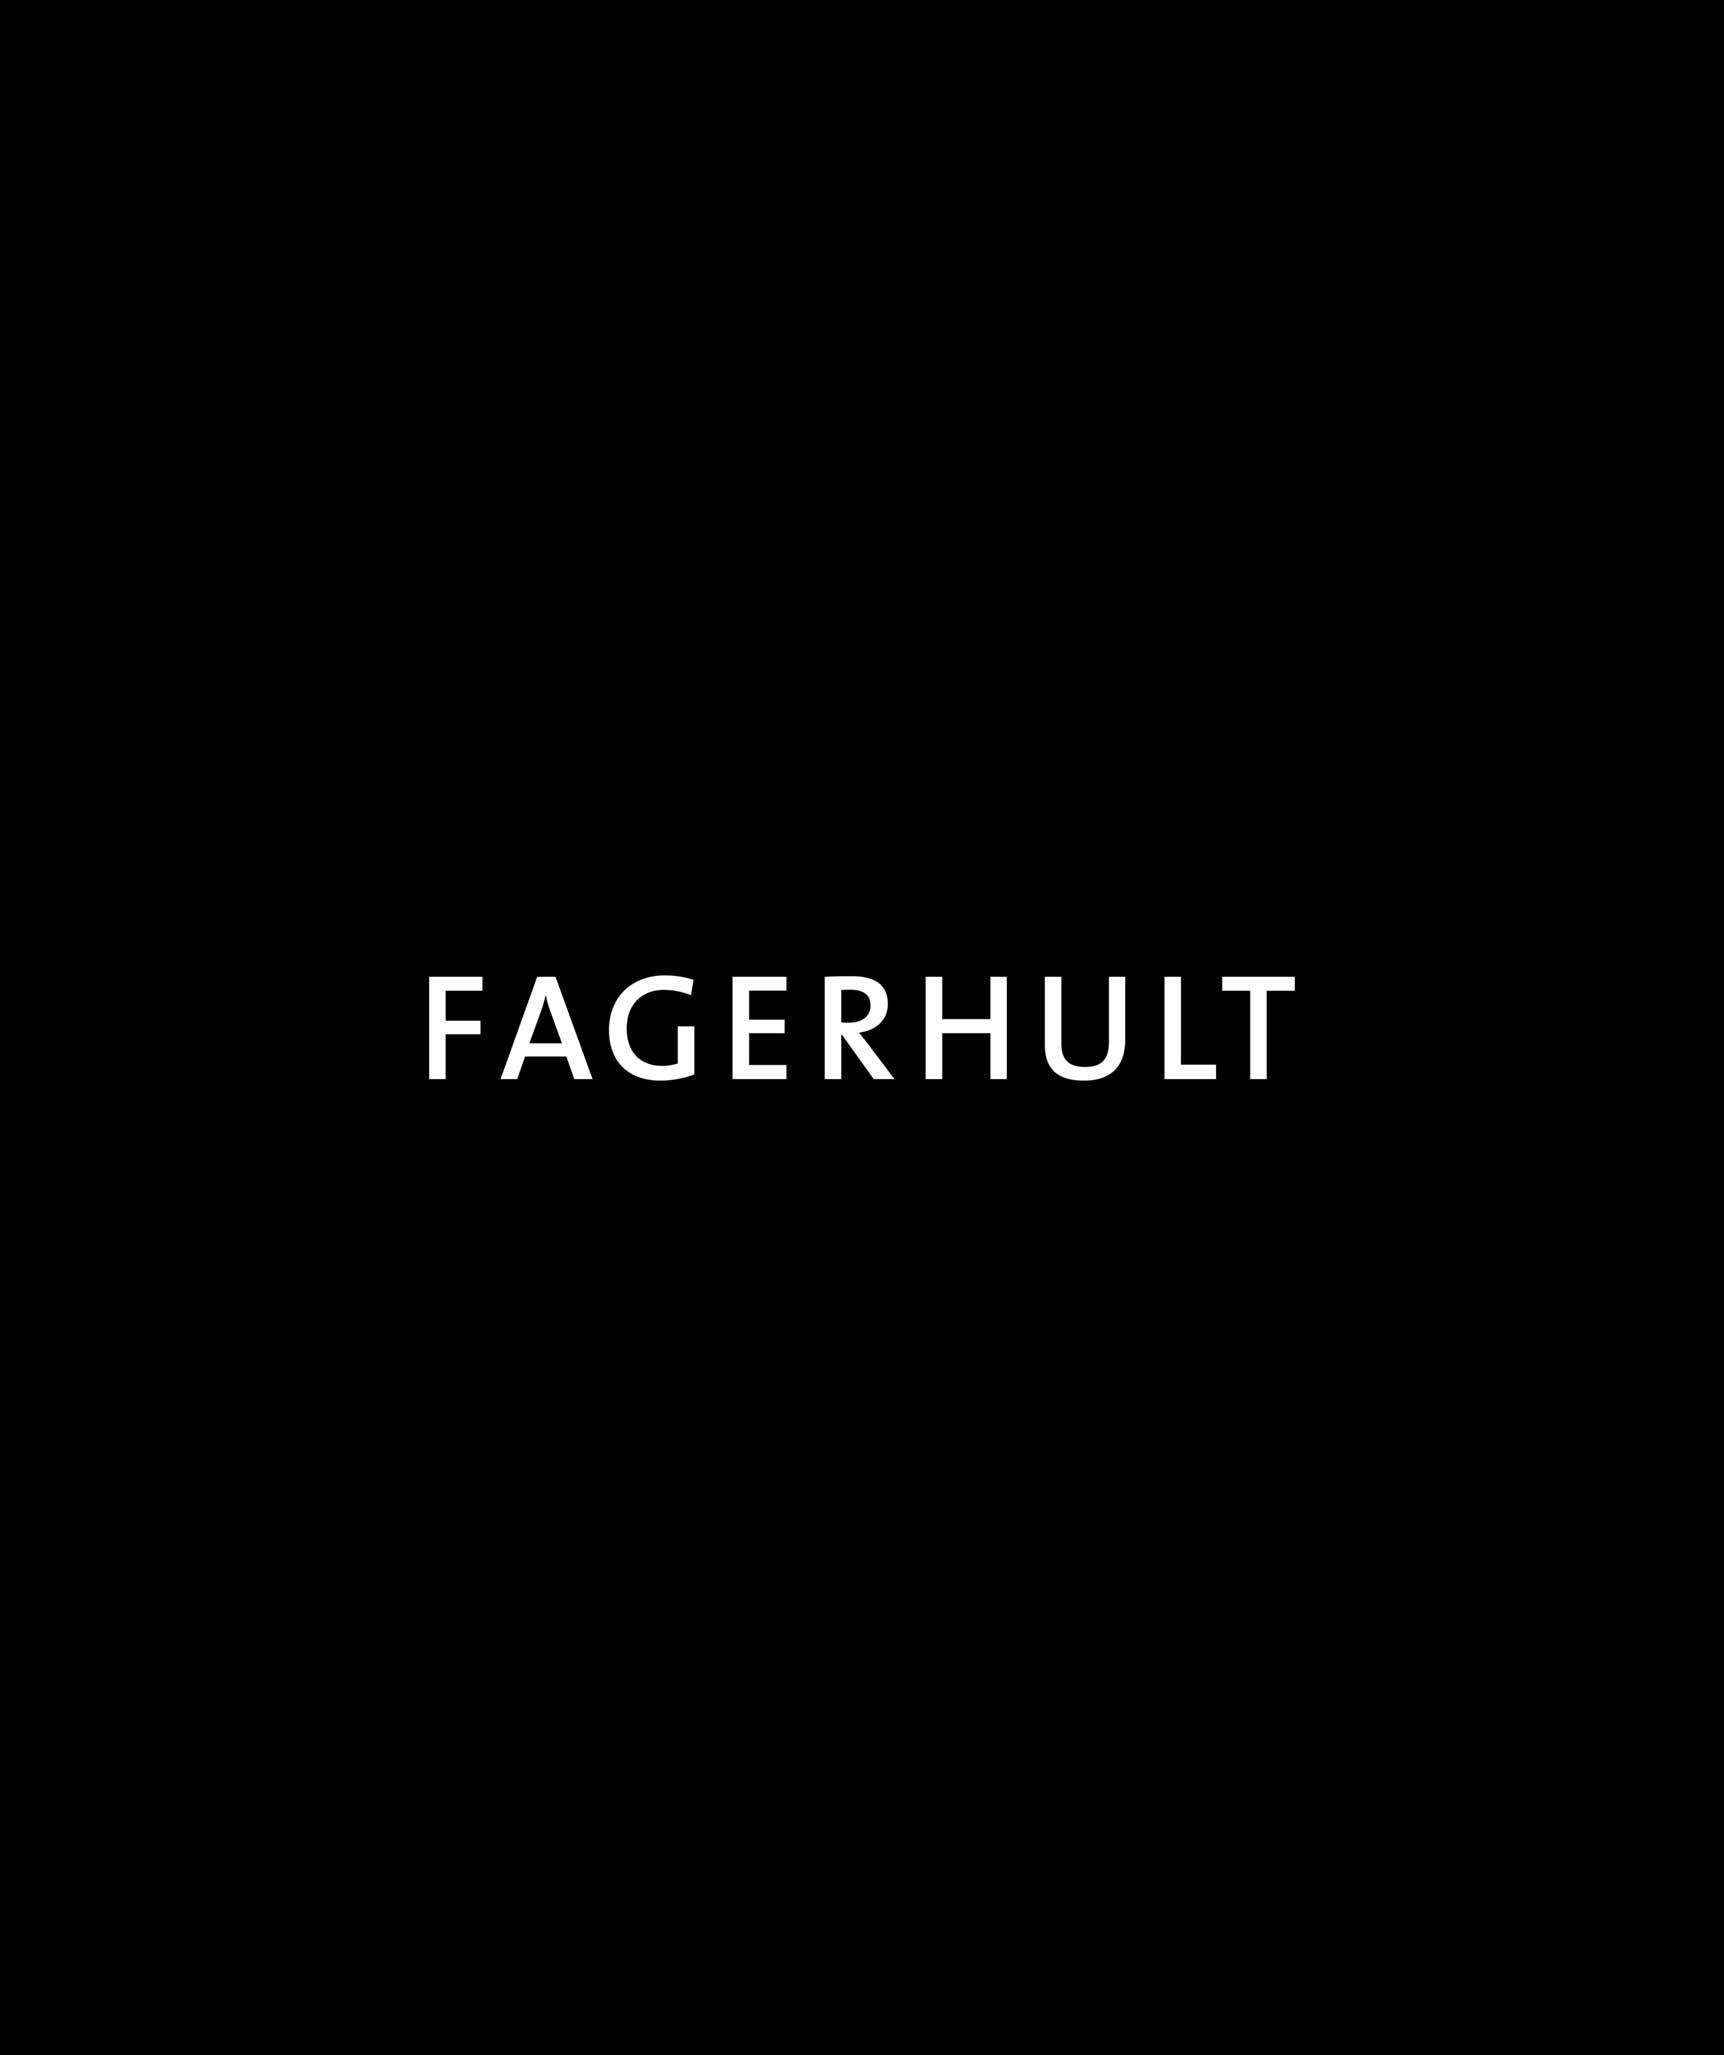 Fagerhult - e-Sense Stage #7